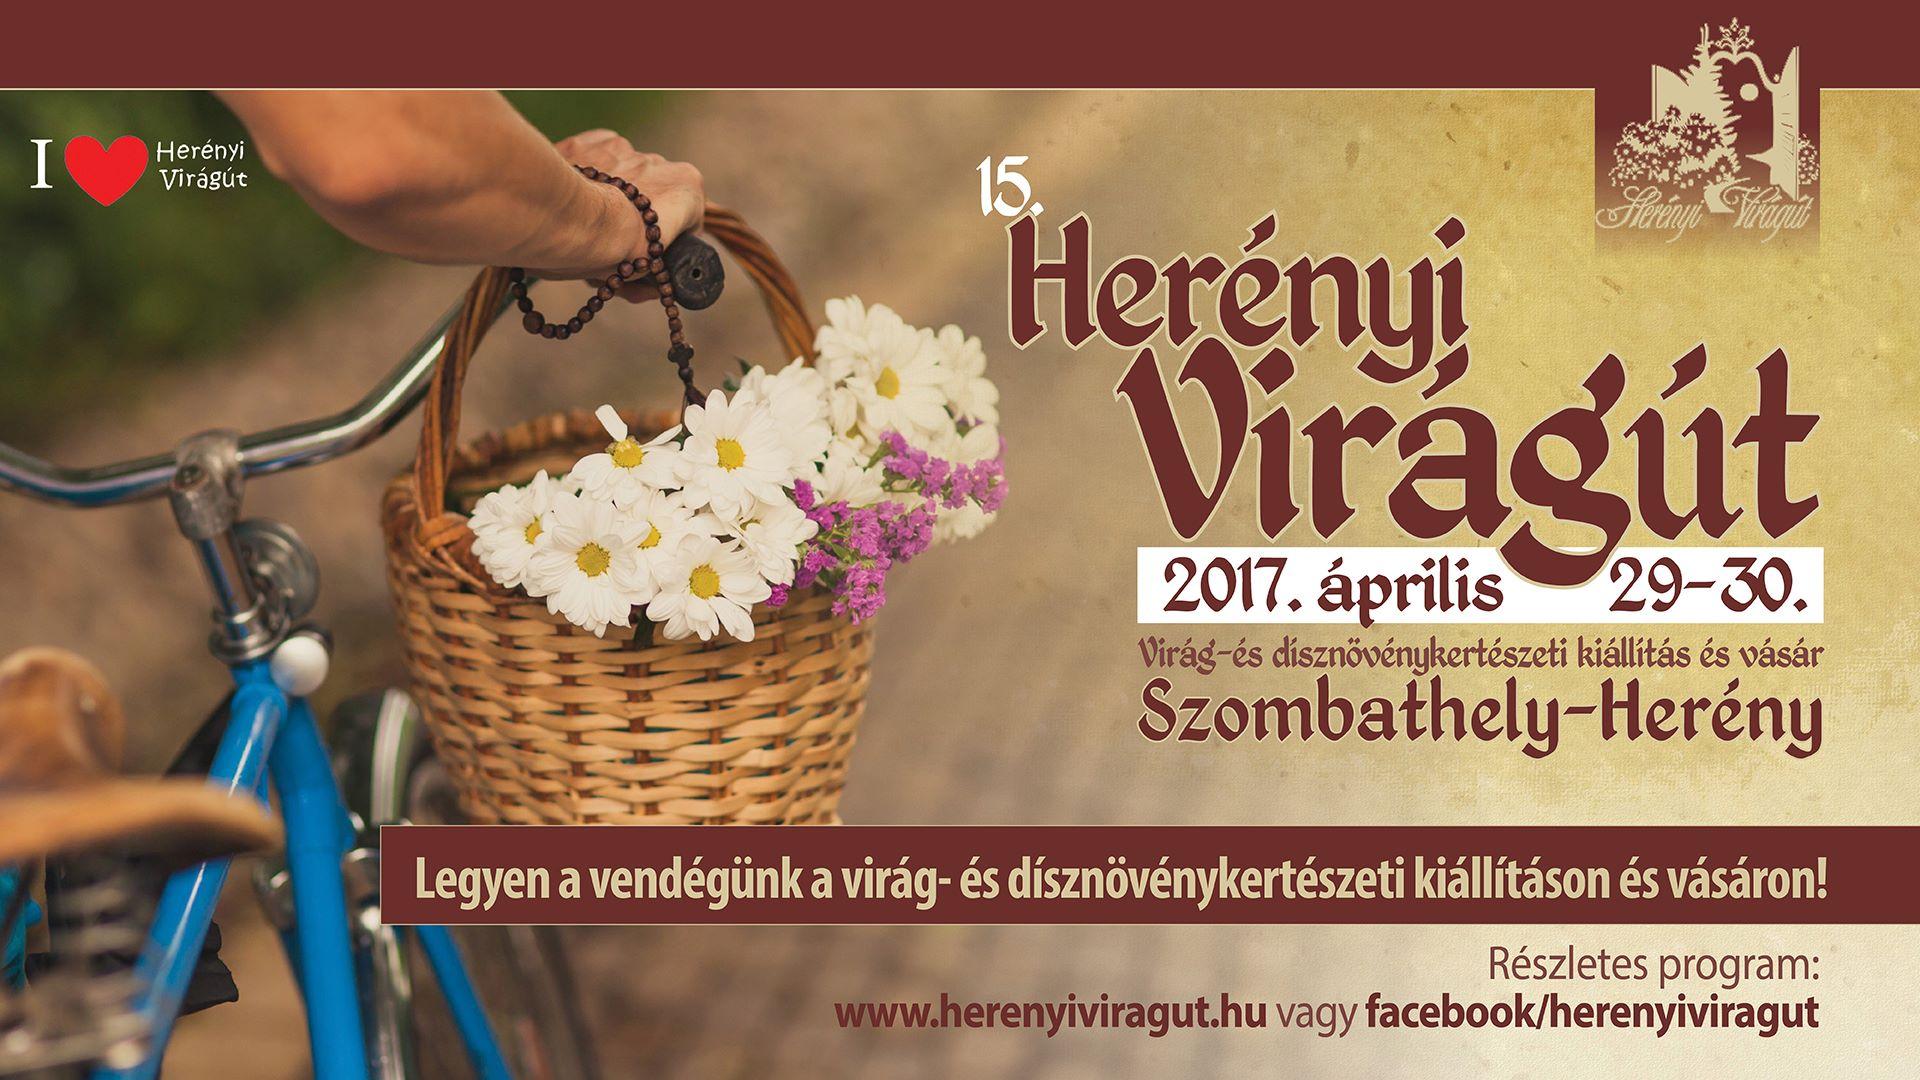 Herényi virgáút